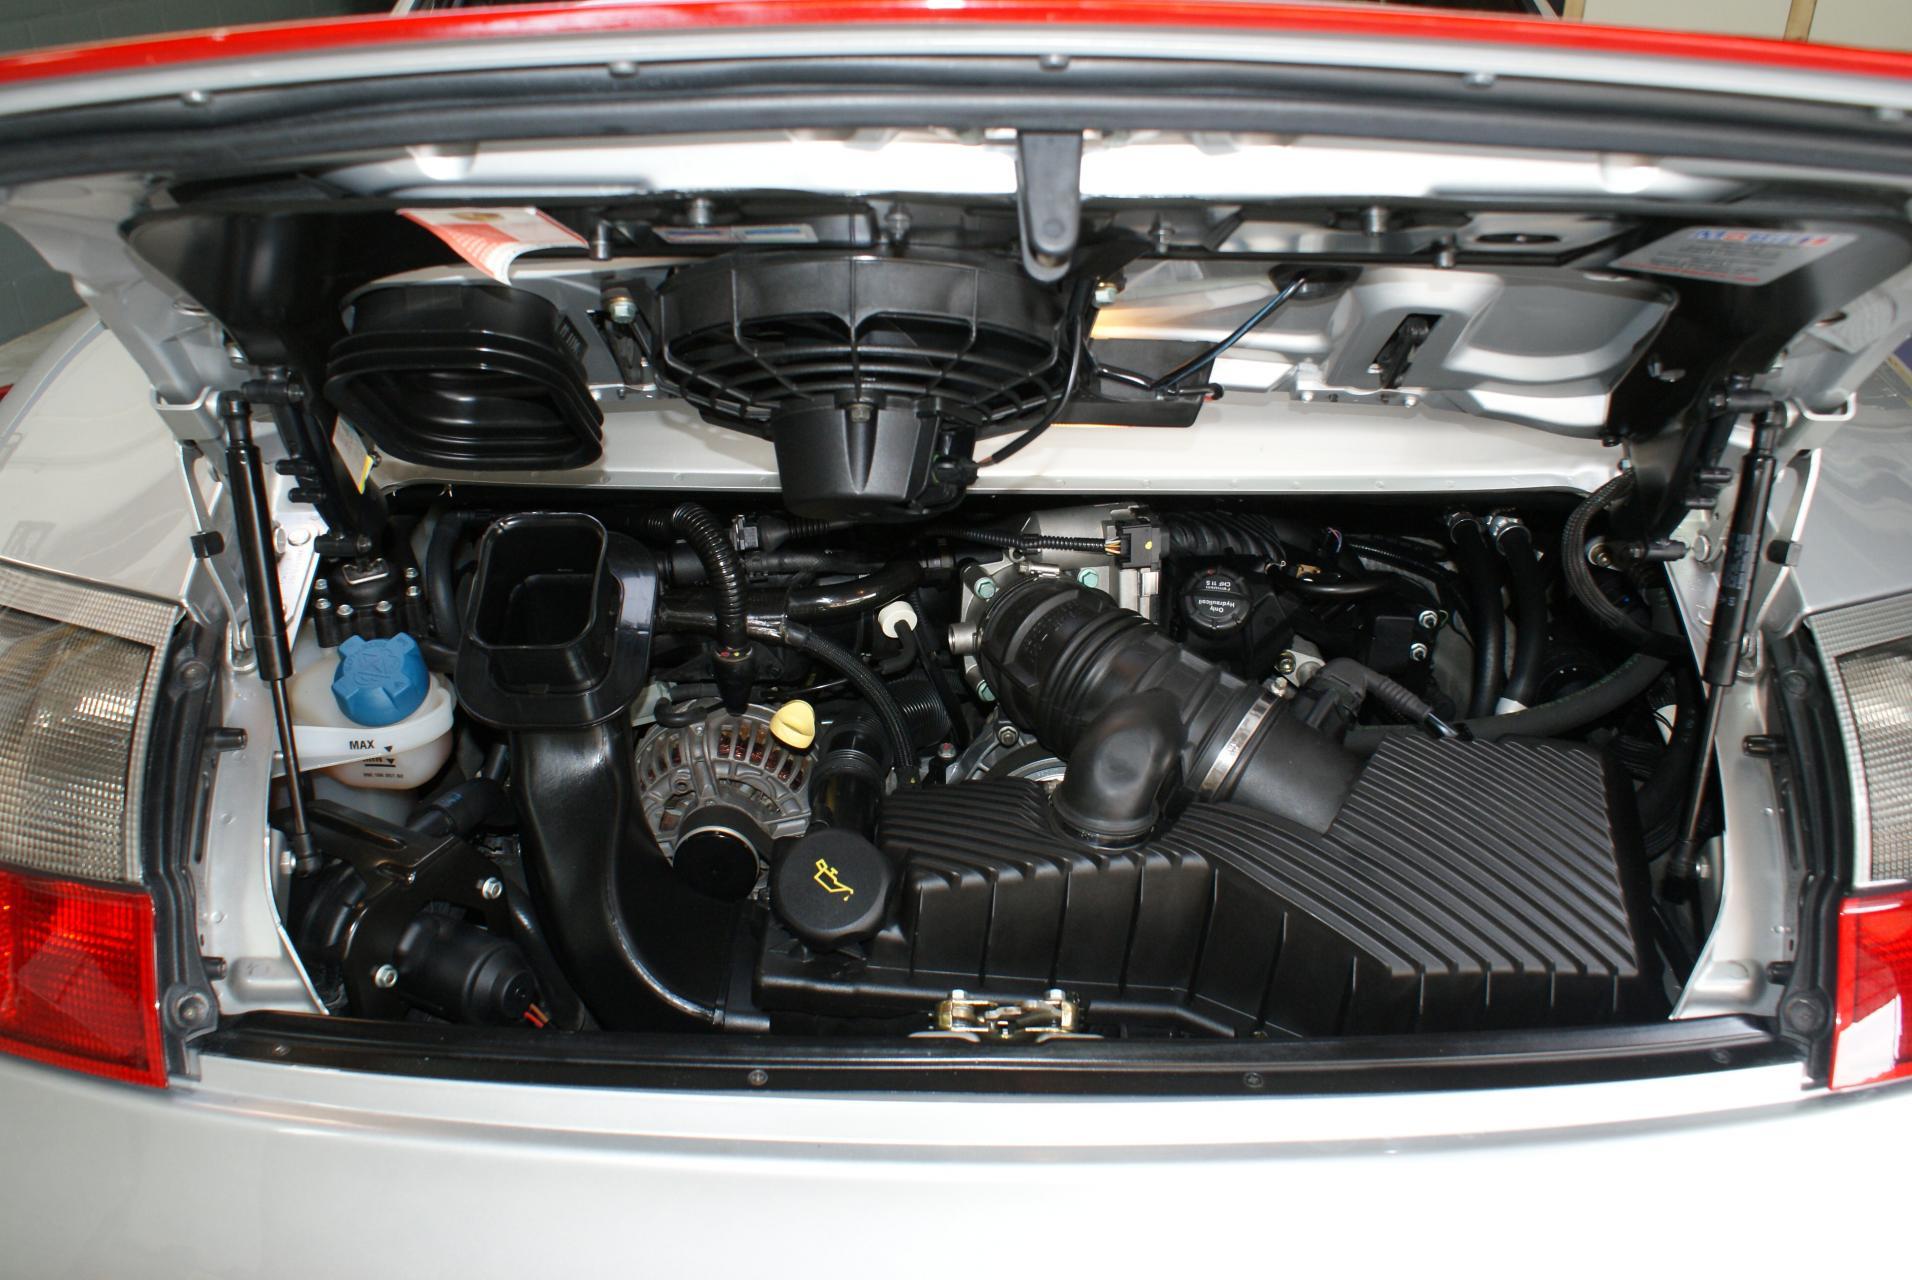 911 youngtimer Porsche 996 Carrera 4S Arctic Silver 2002 - 15 van 15